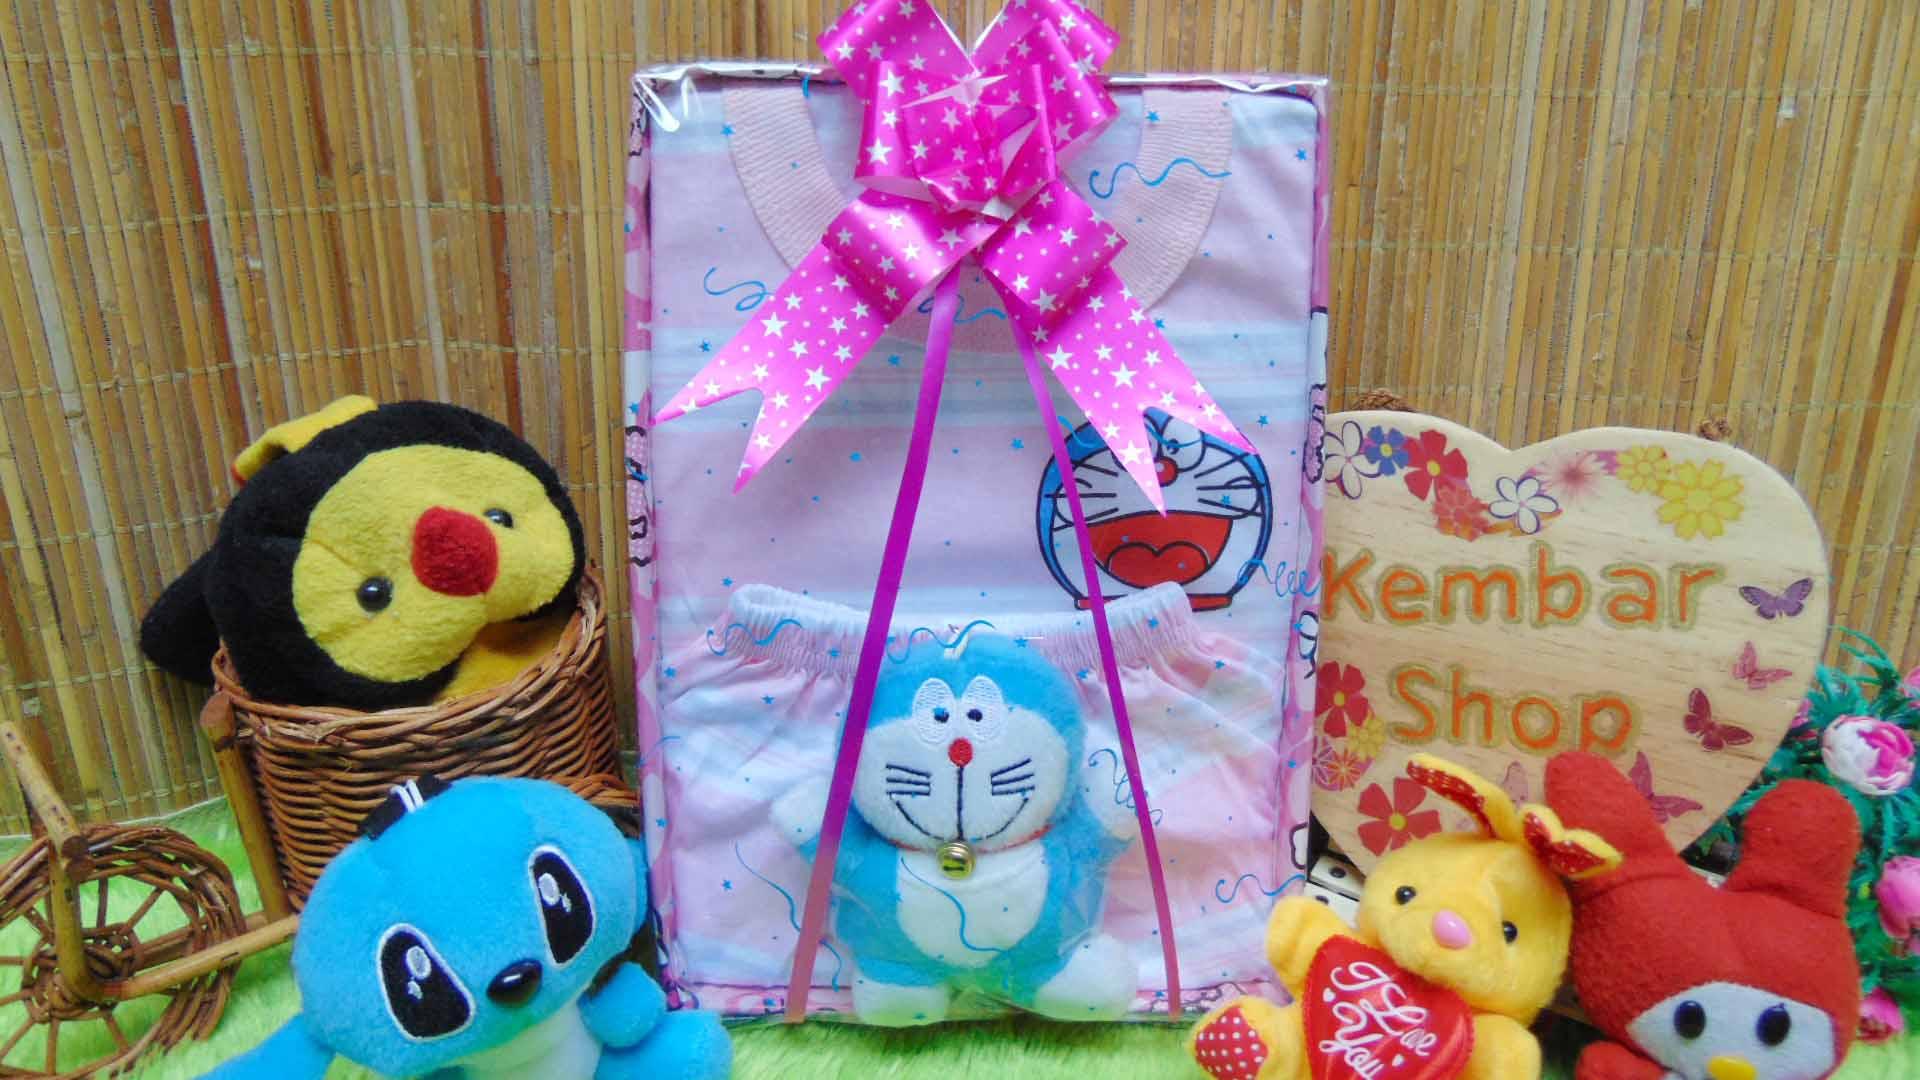 utama - FREE KARTU UCAPAN Kado Lahiran Paket Kado Bayi Baby Gift Box Doraemon Pink 2in1 49 terdiri dari setelan kaos doraemon 0-12bln dan boneka doraemon lucu